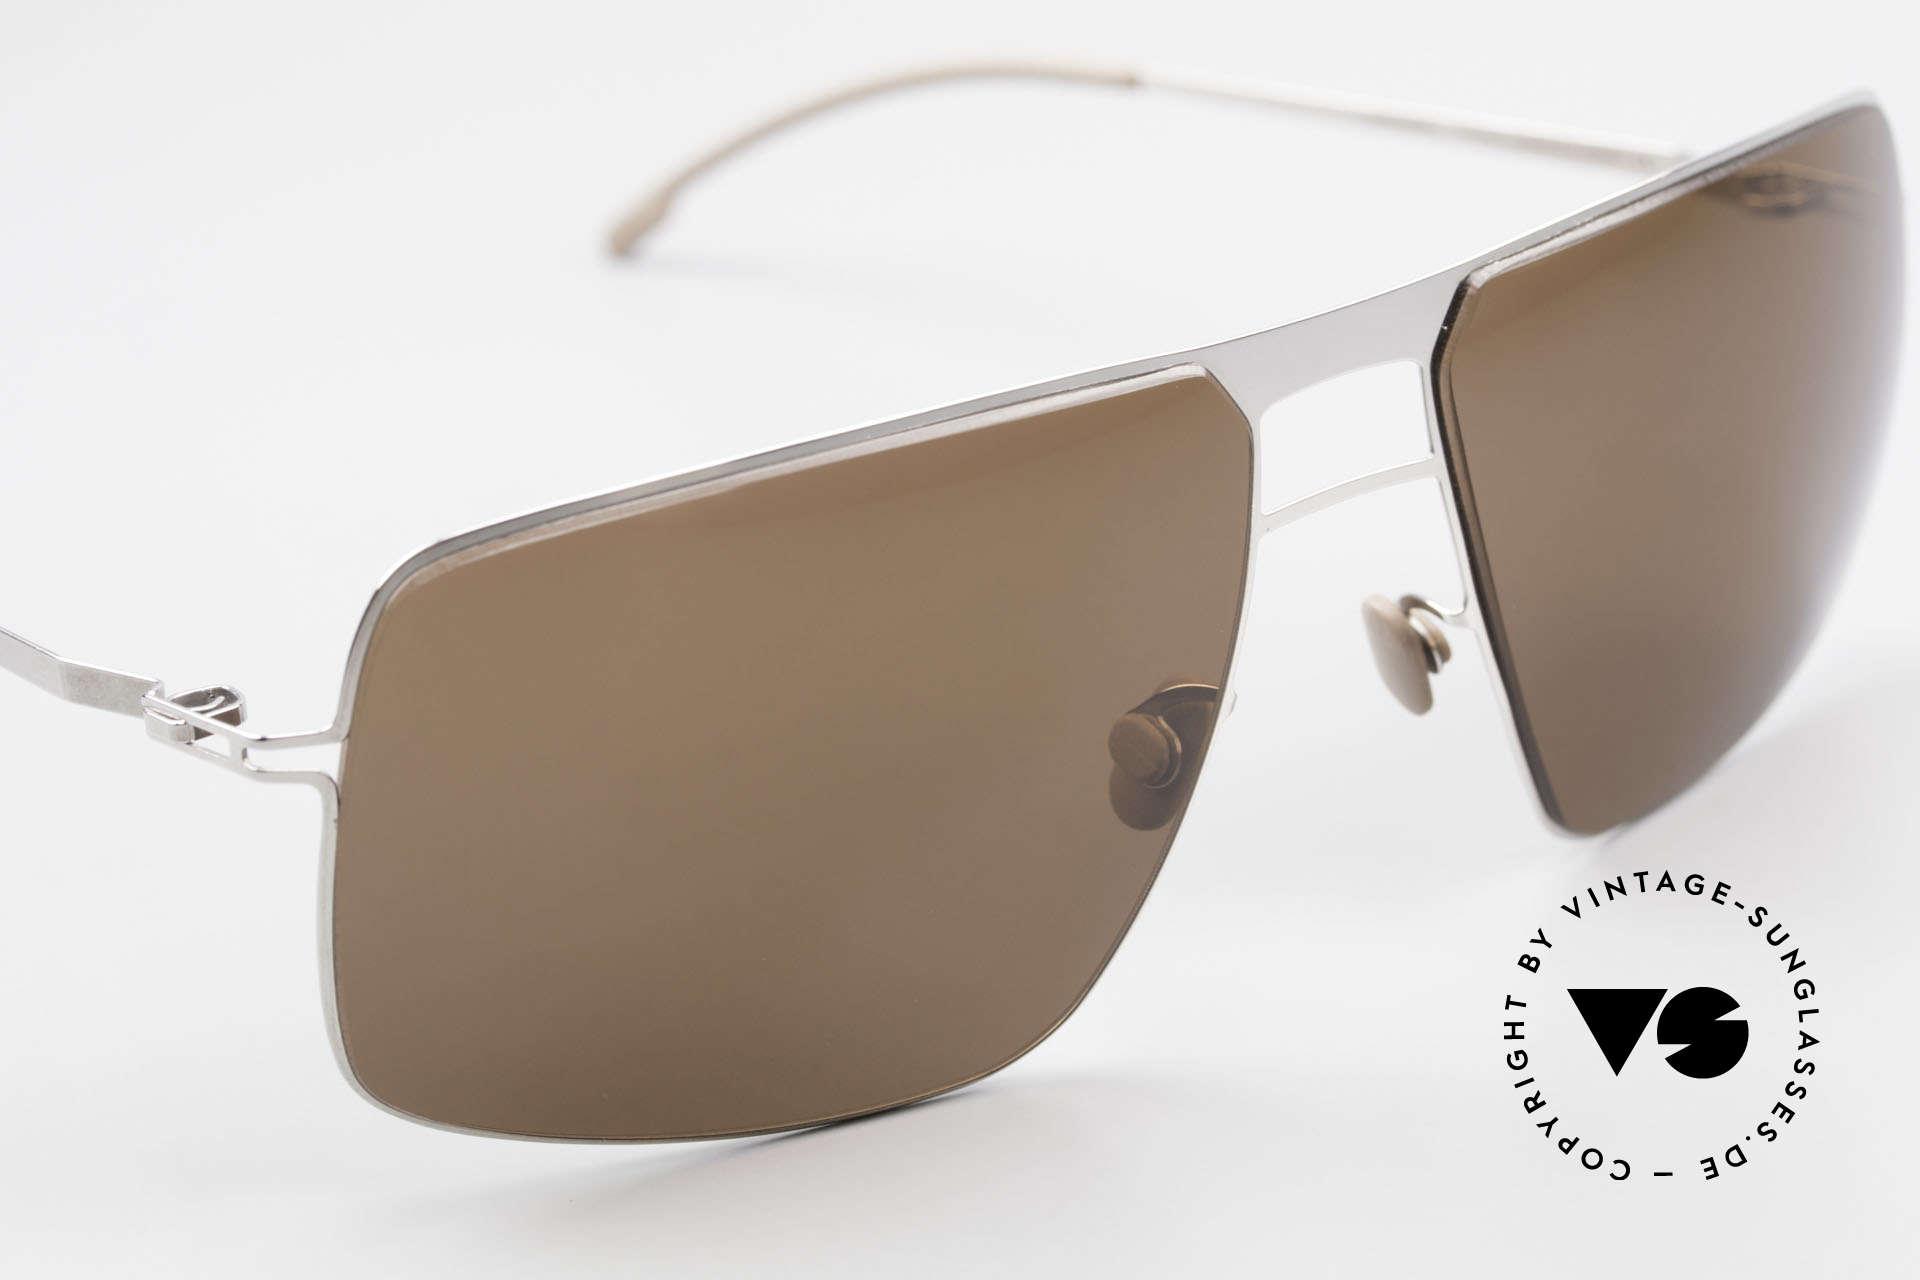 Mykita Leif Men's Designer Sunglasses 2011, top-notch quality, made in Germany (Berlin-Kreuzberg), Made for Men